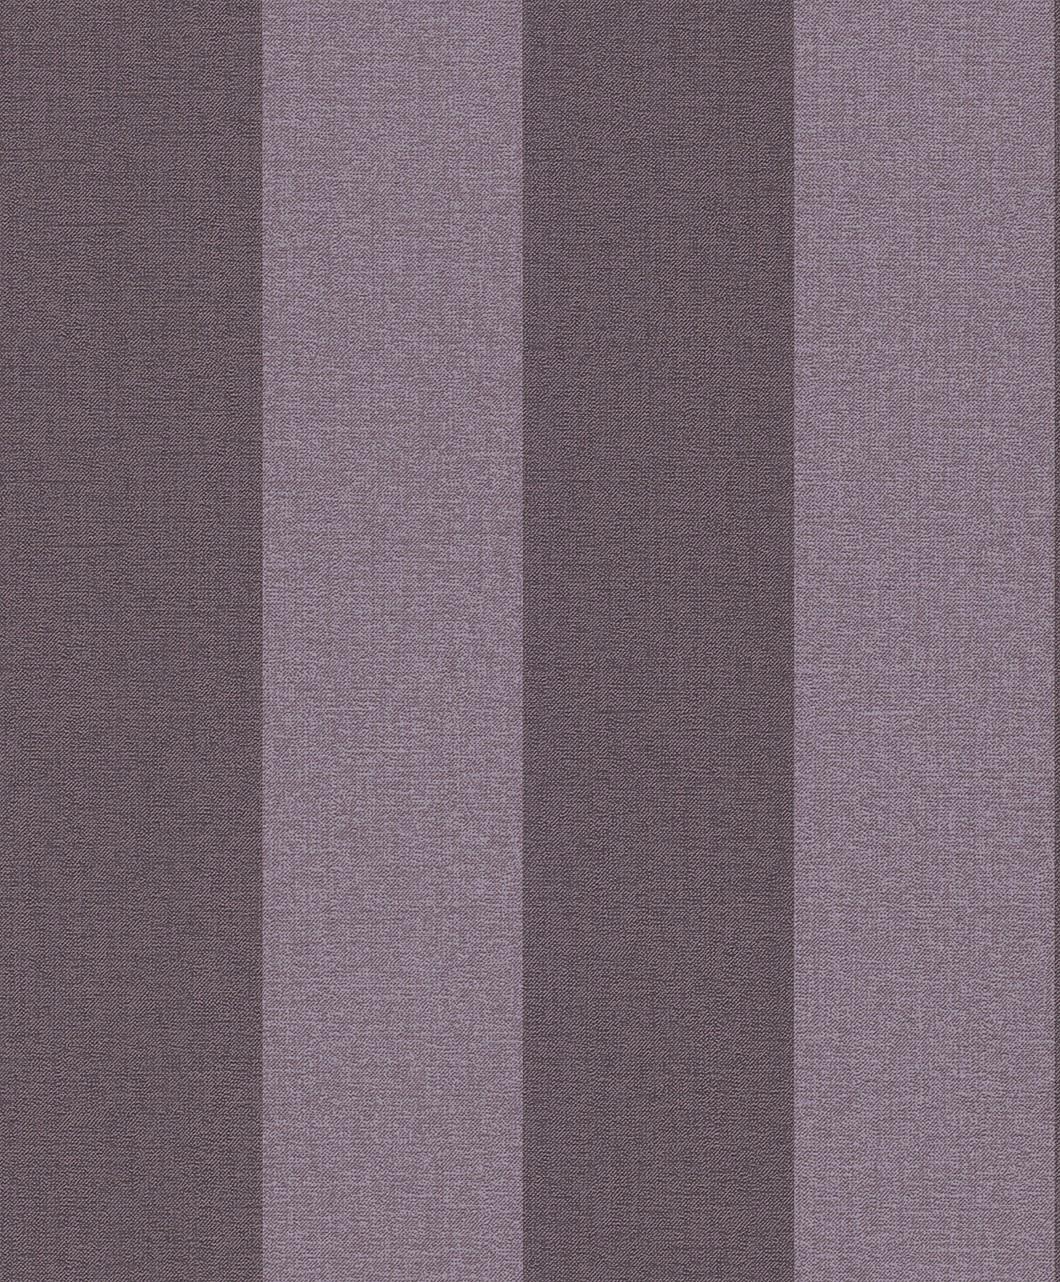 Rasch Textil Tapete Jimbo : Details Zu Rasch Textil Girotondo Tapete Nr 006088 Kindertapete